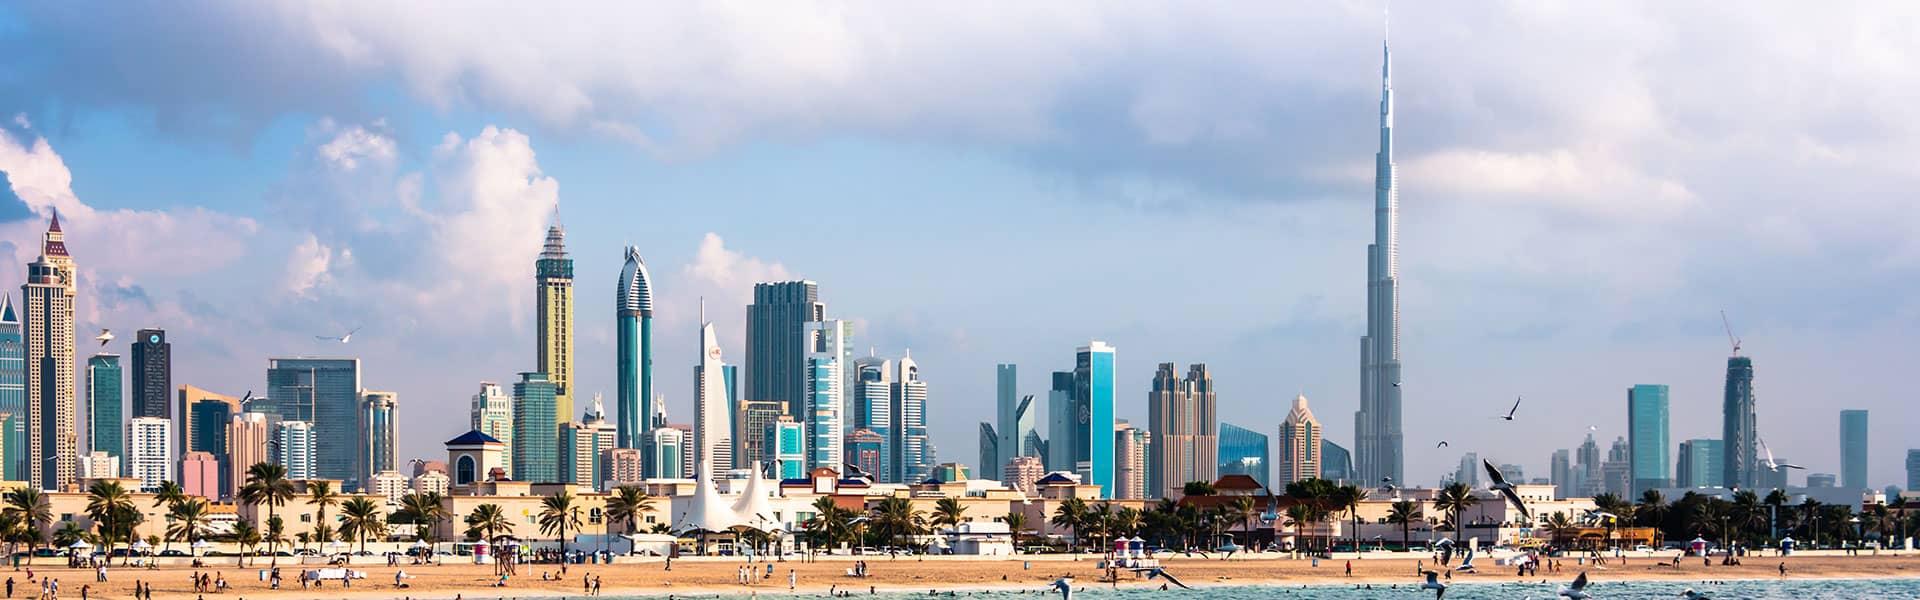 Bayut com | UAE's Largest Property Portal | Homes Live Here